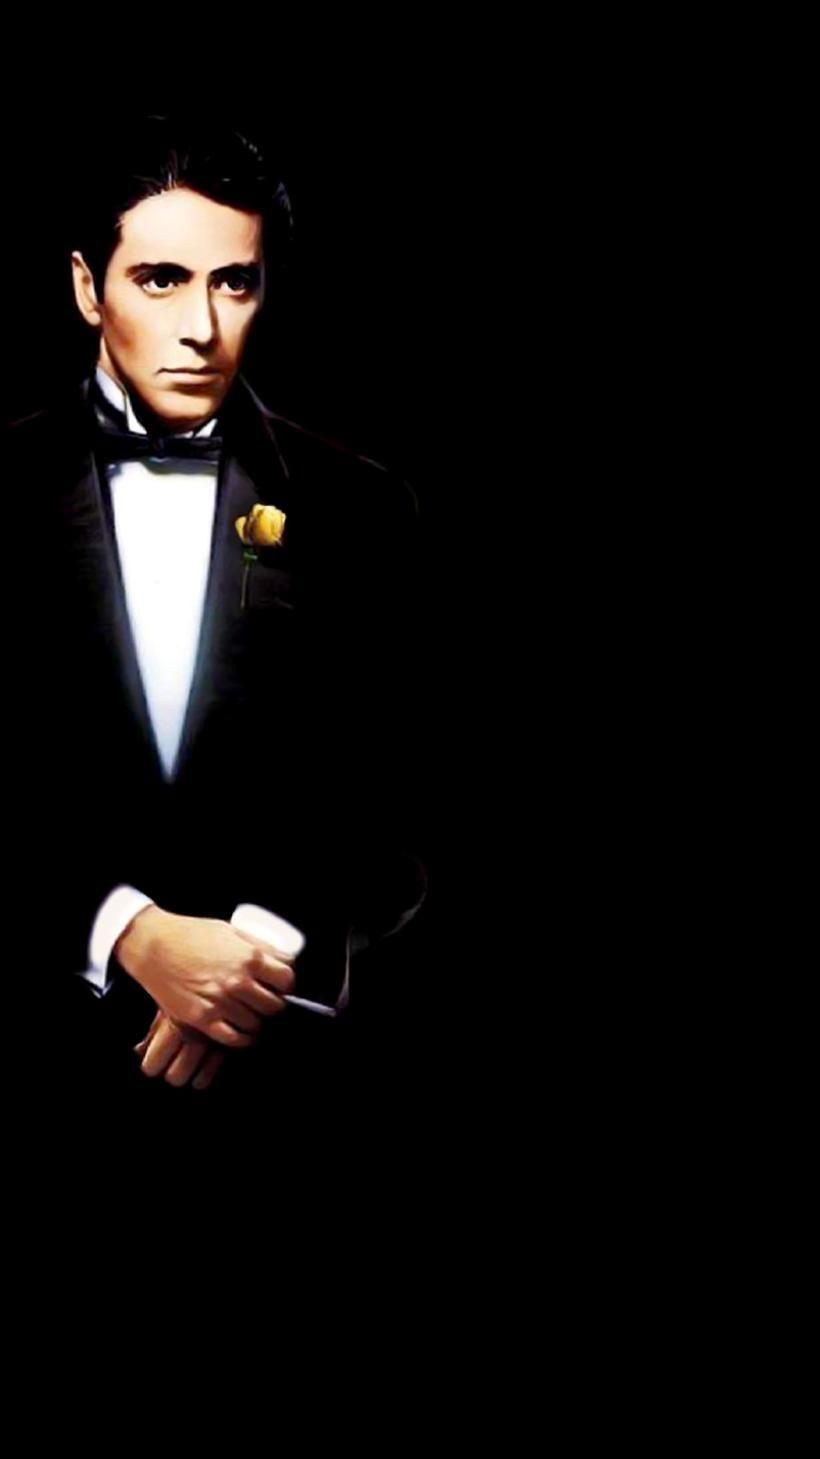 Godfather Part 2 Poster - HD Wallpaper